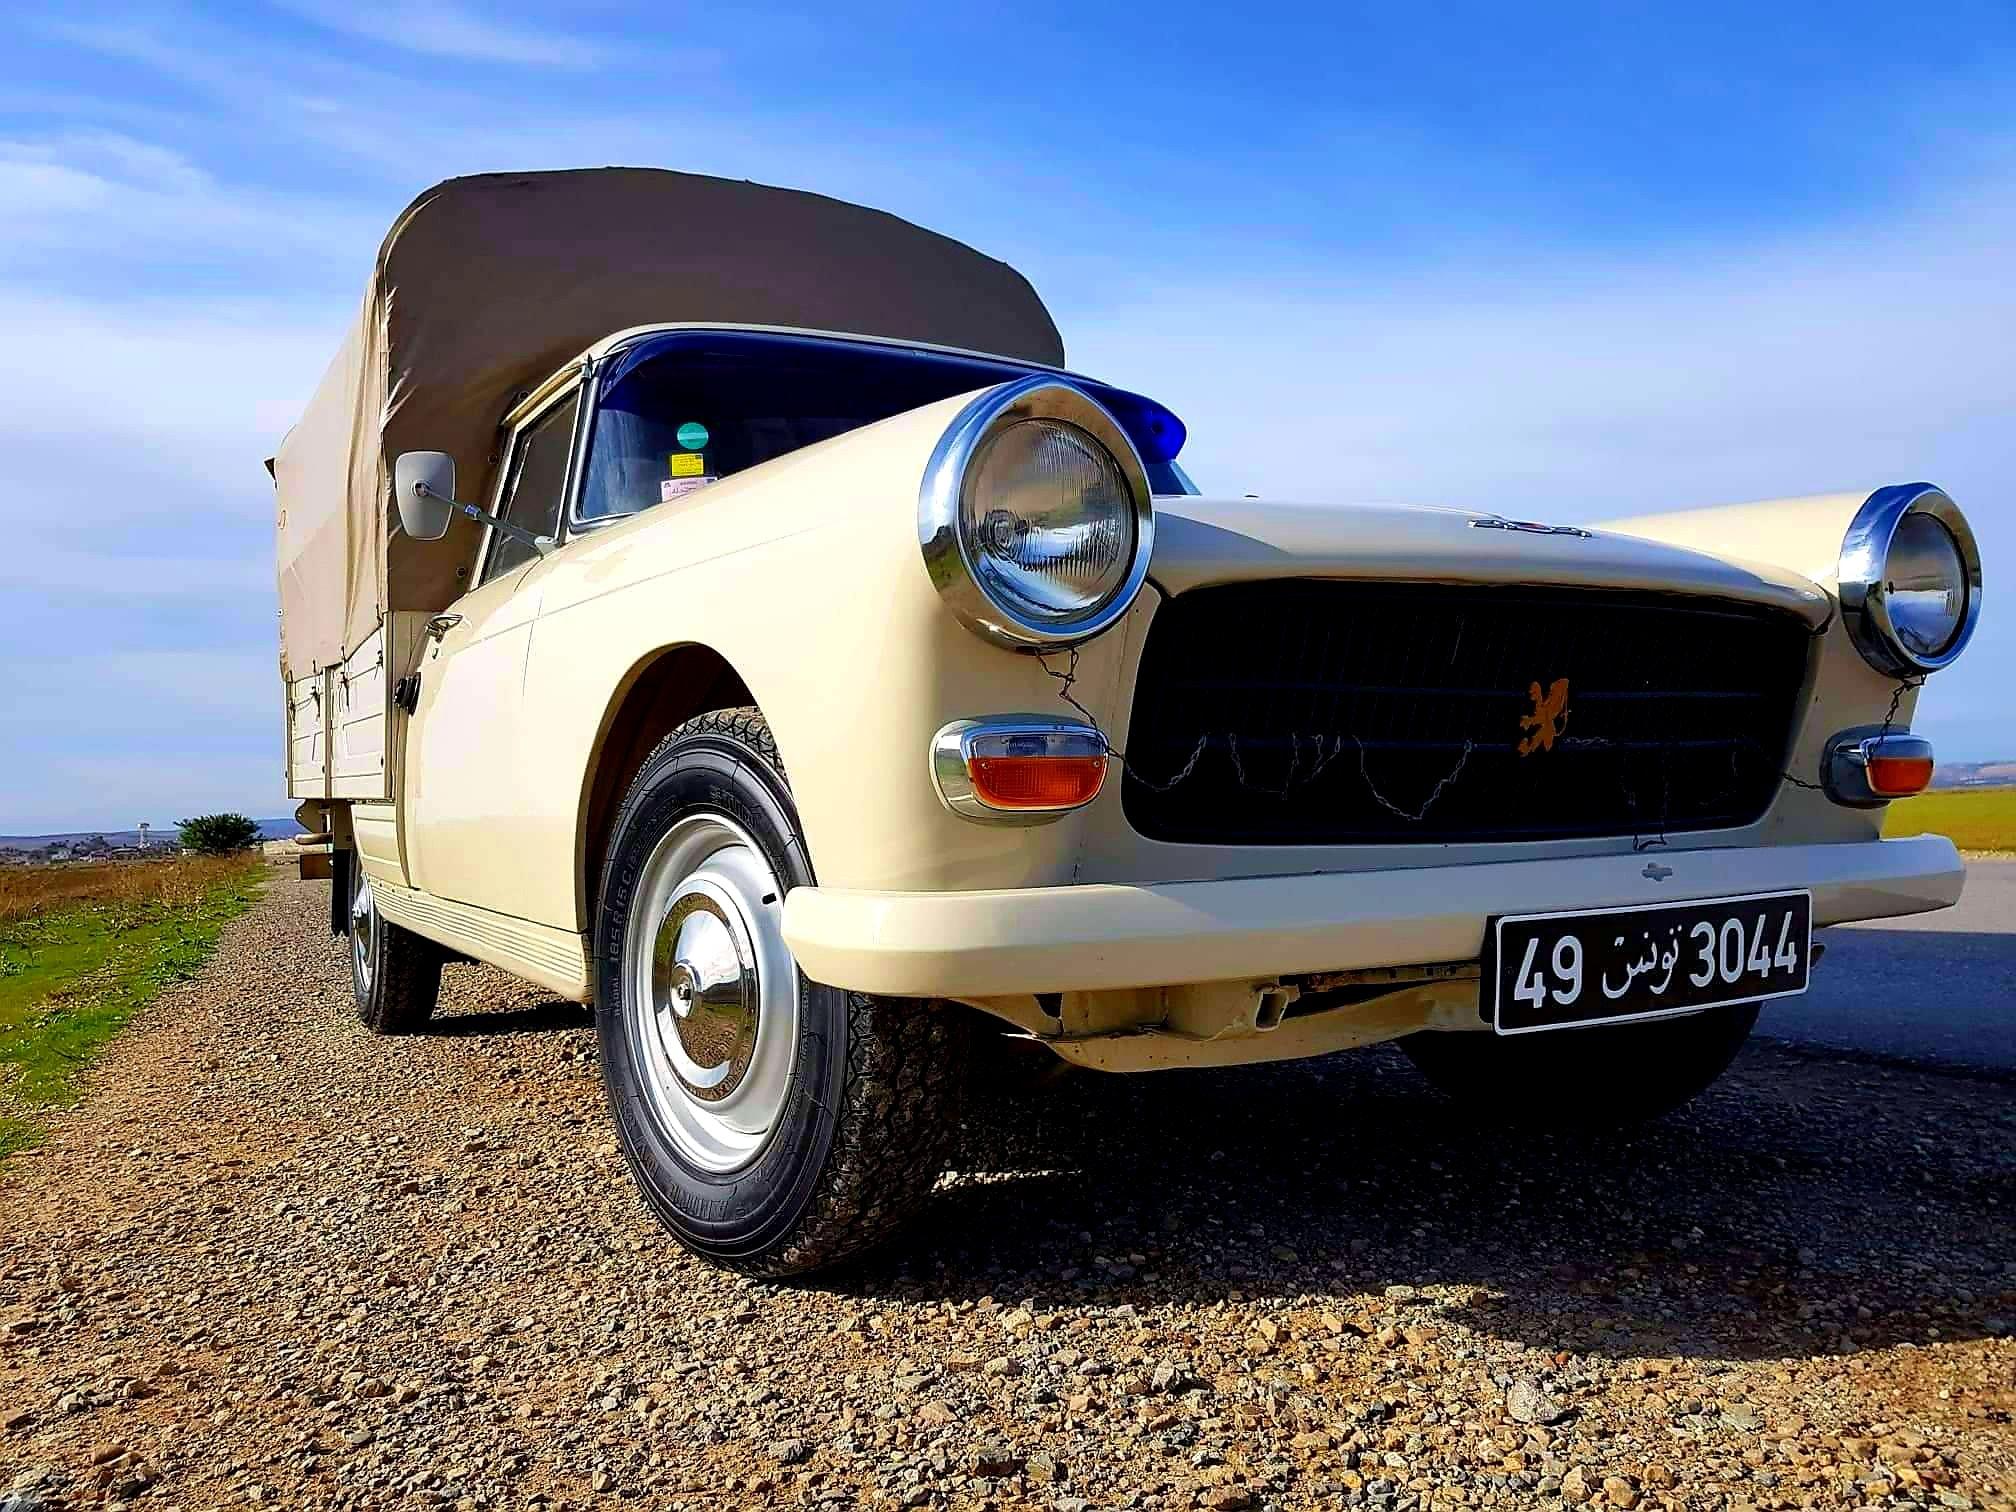 Peugeot-404-bachee-Tunisie-(2)